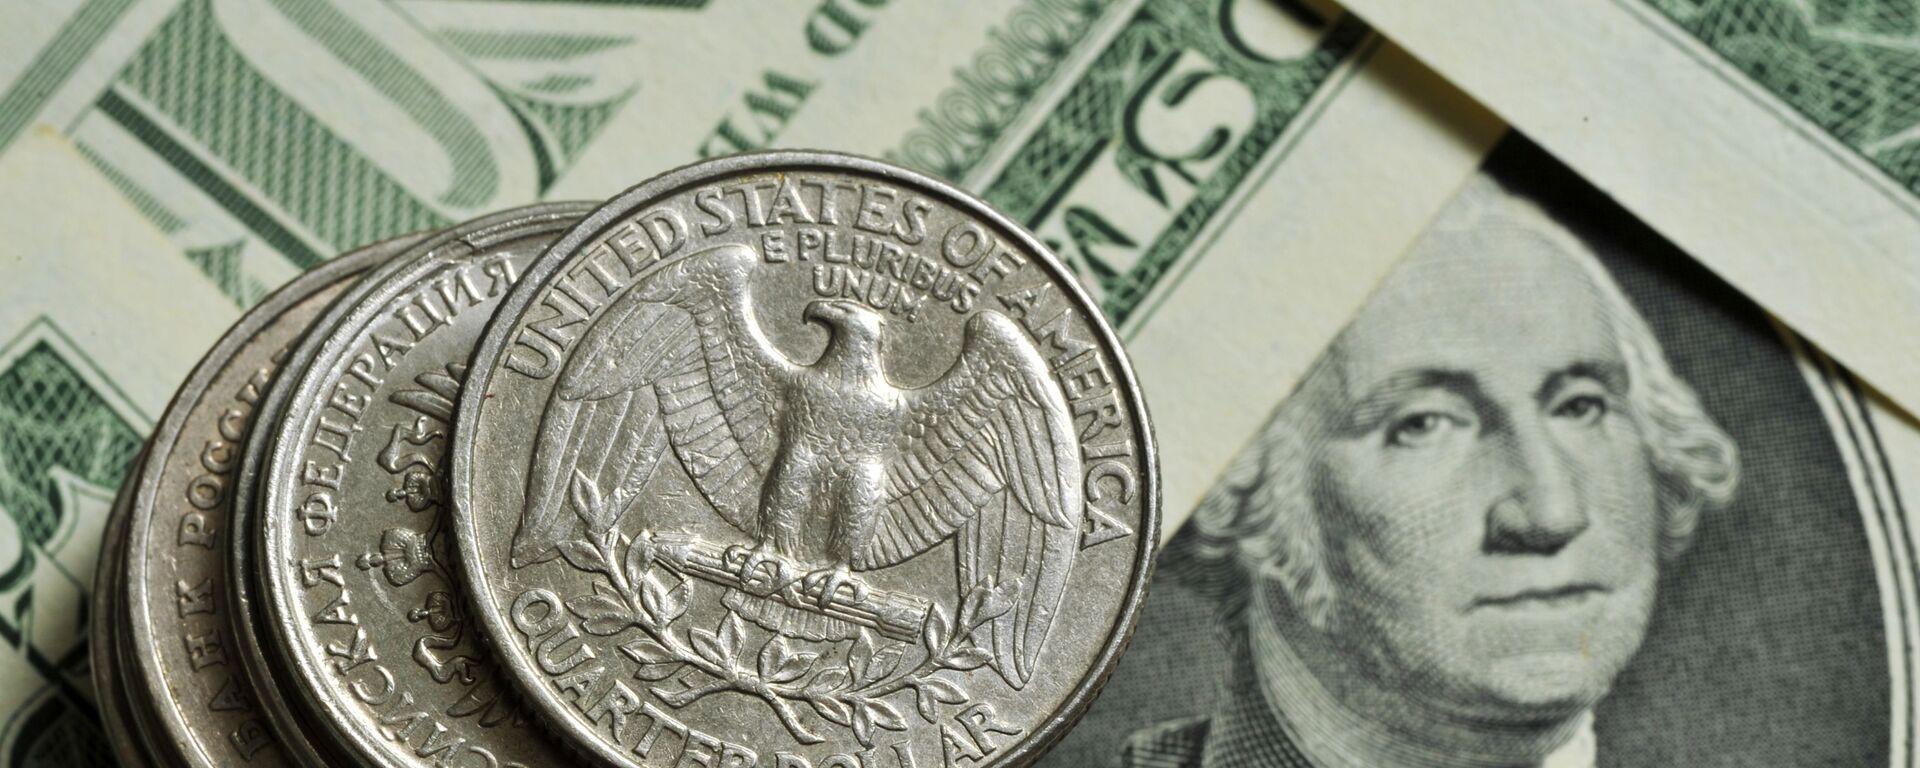 Монеты различного номинала Монетного двора США на фоне банкноты номиналом 1 доллар США - Sputnik Таджикистан, 1920, 31.03.2021